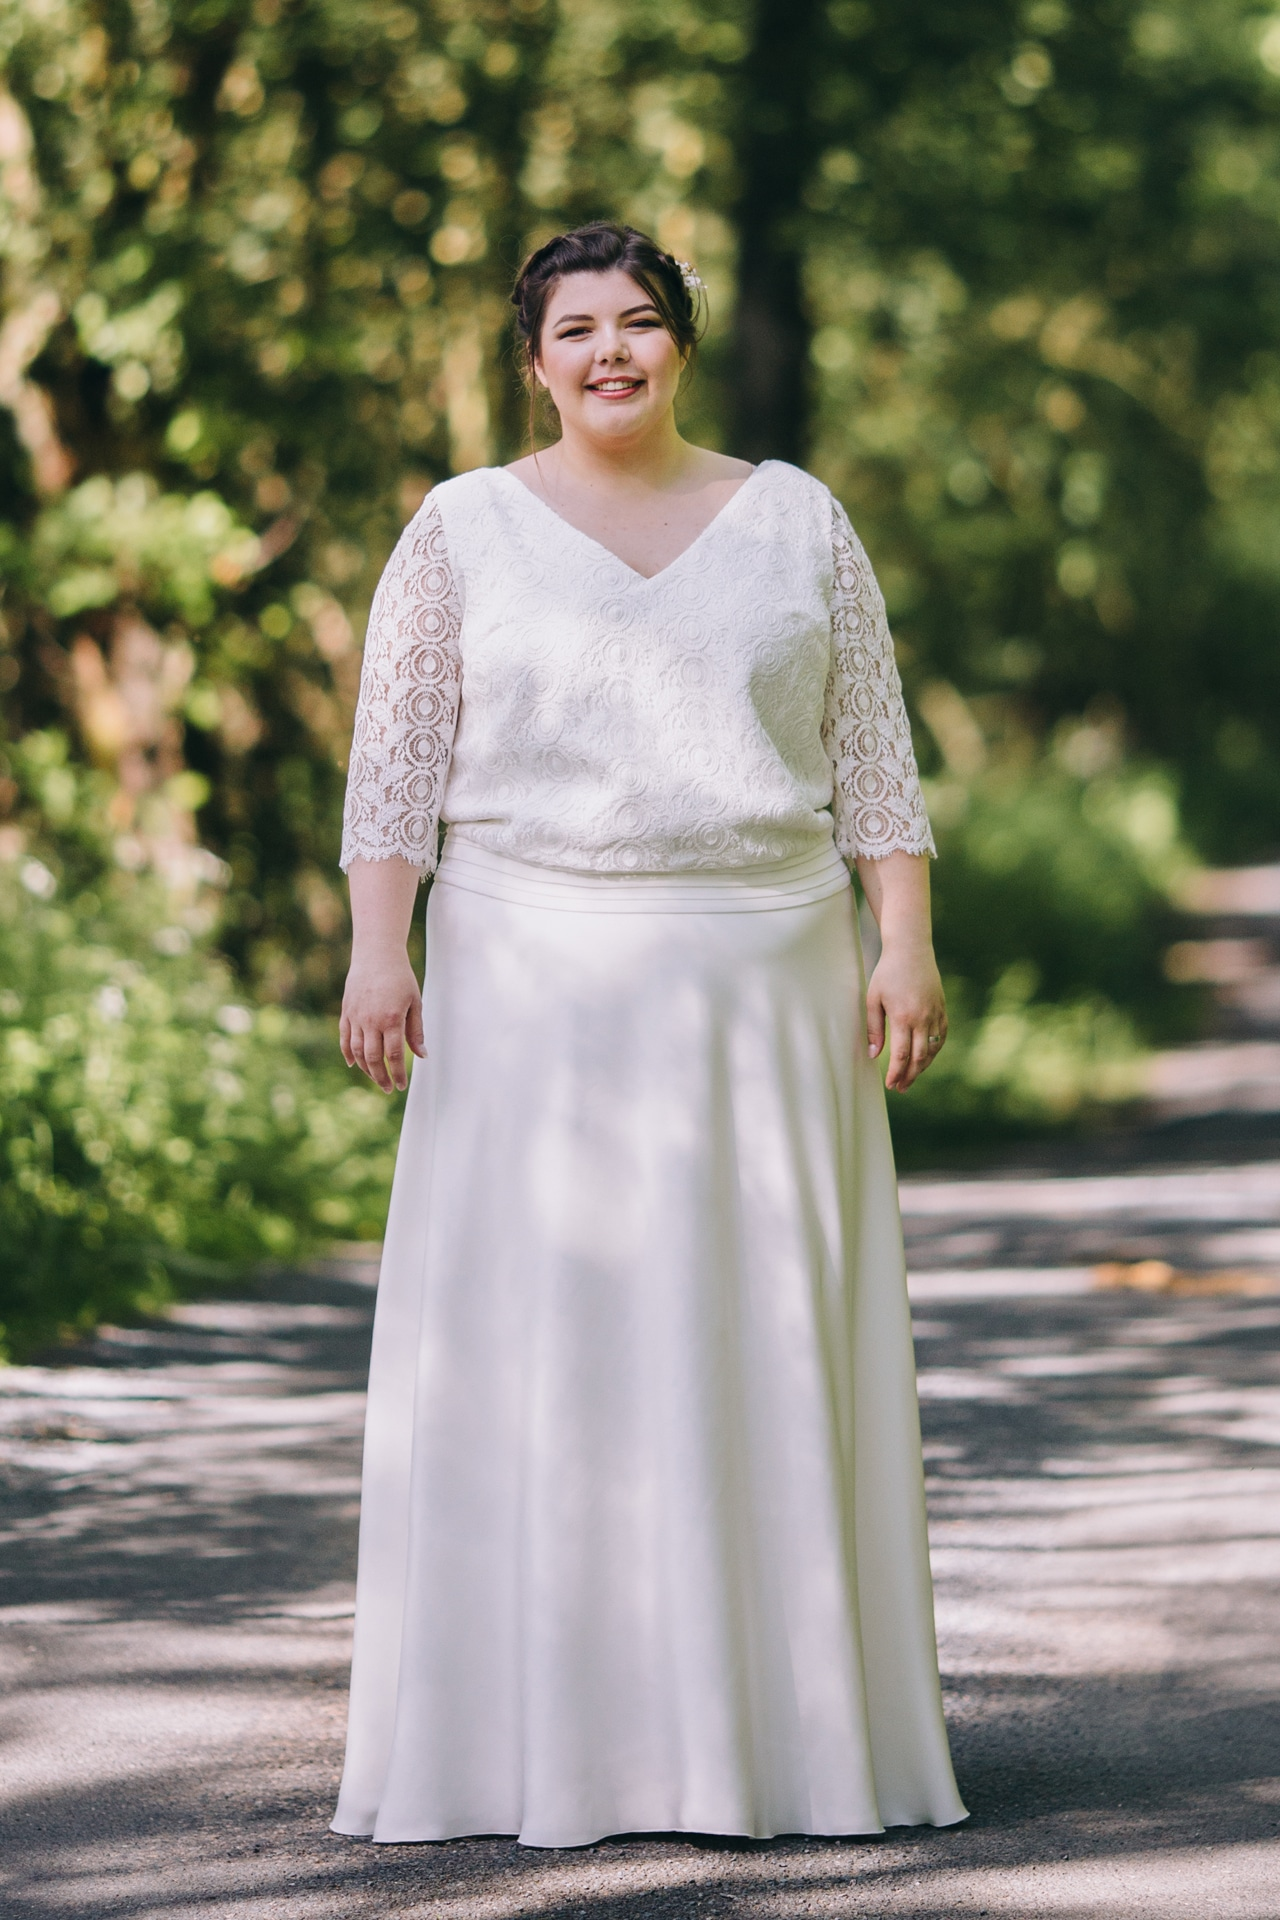 b48b1864497936 collection de robe de mariée grande taille - Causons Mariage